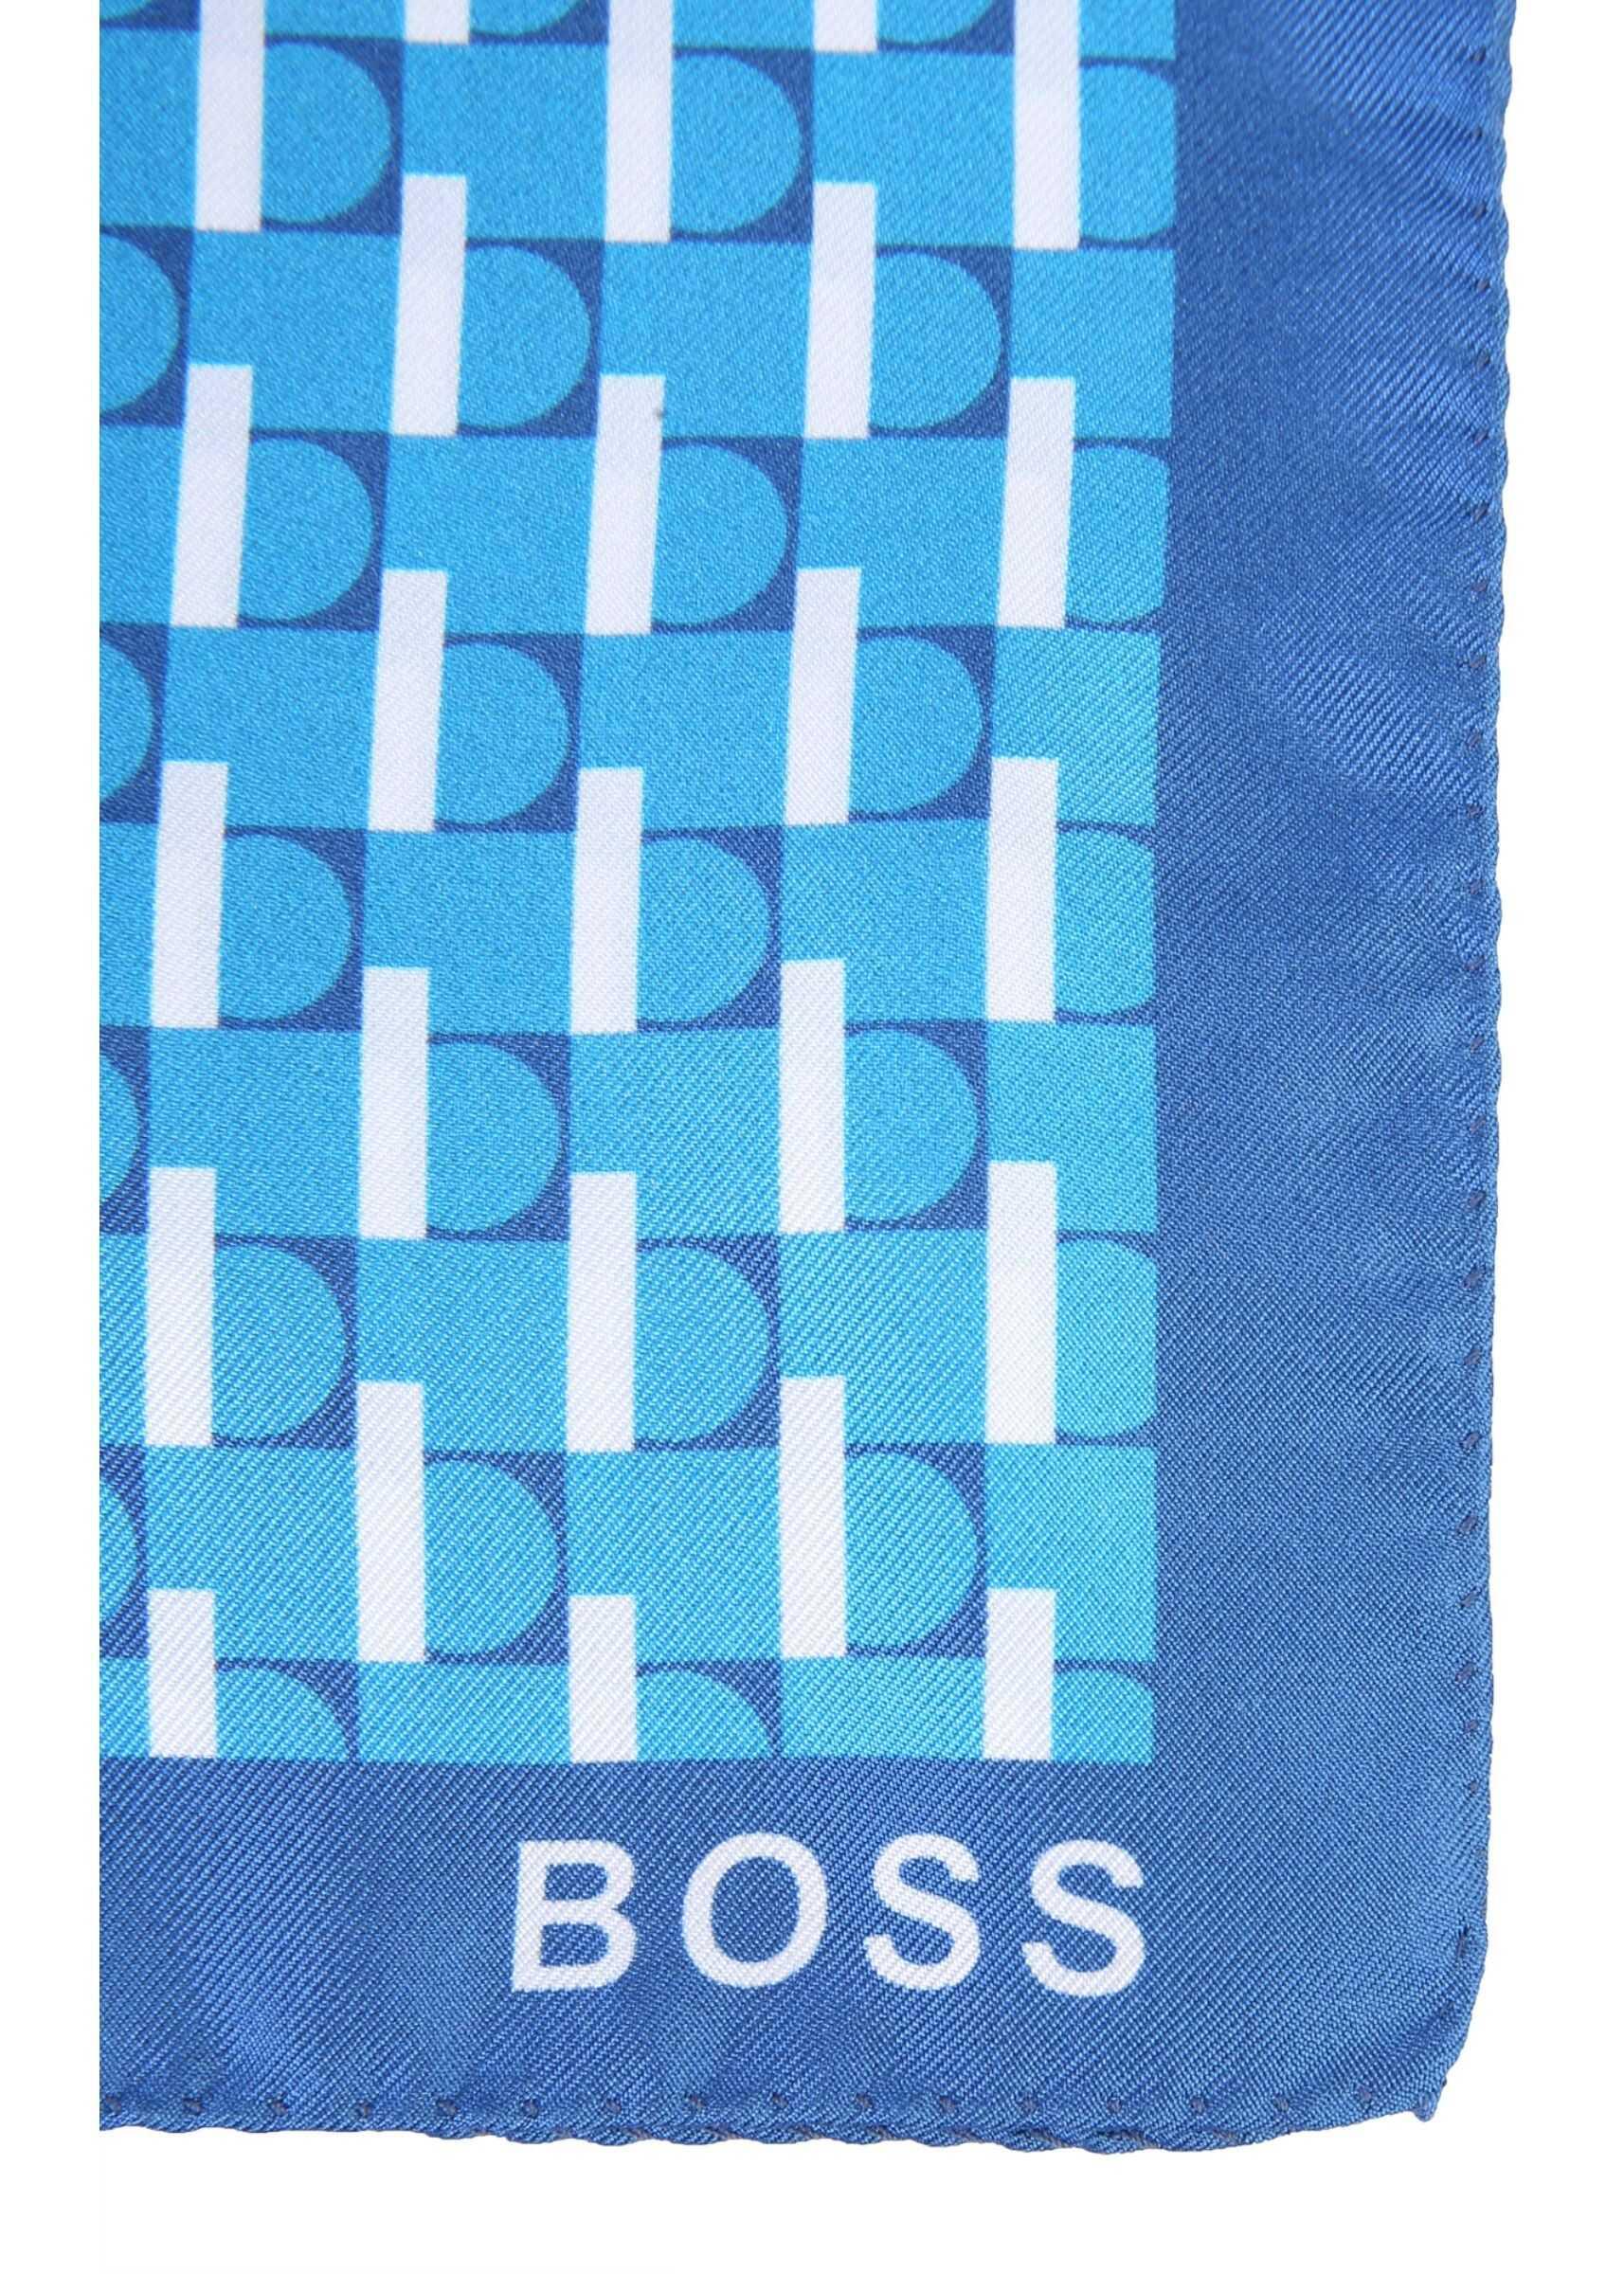 BOSS Printed Scarf AZURE